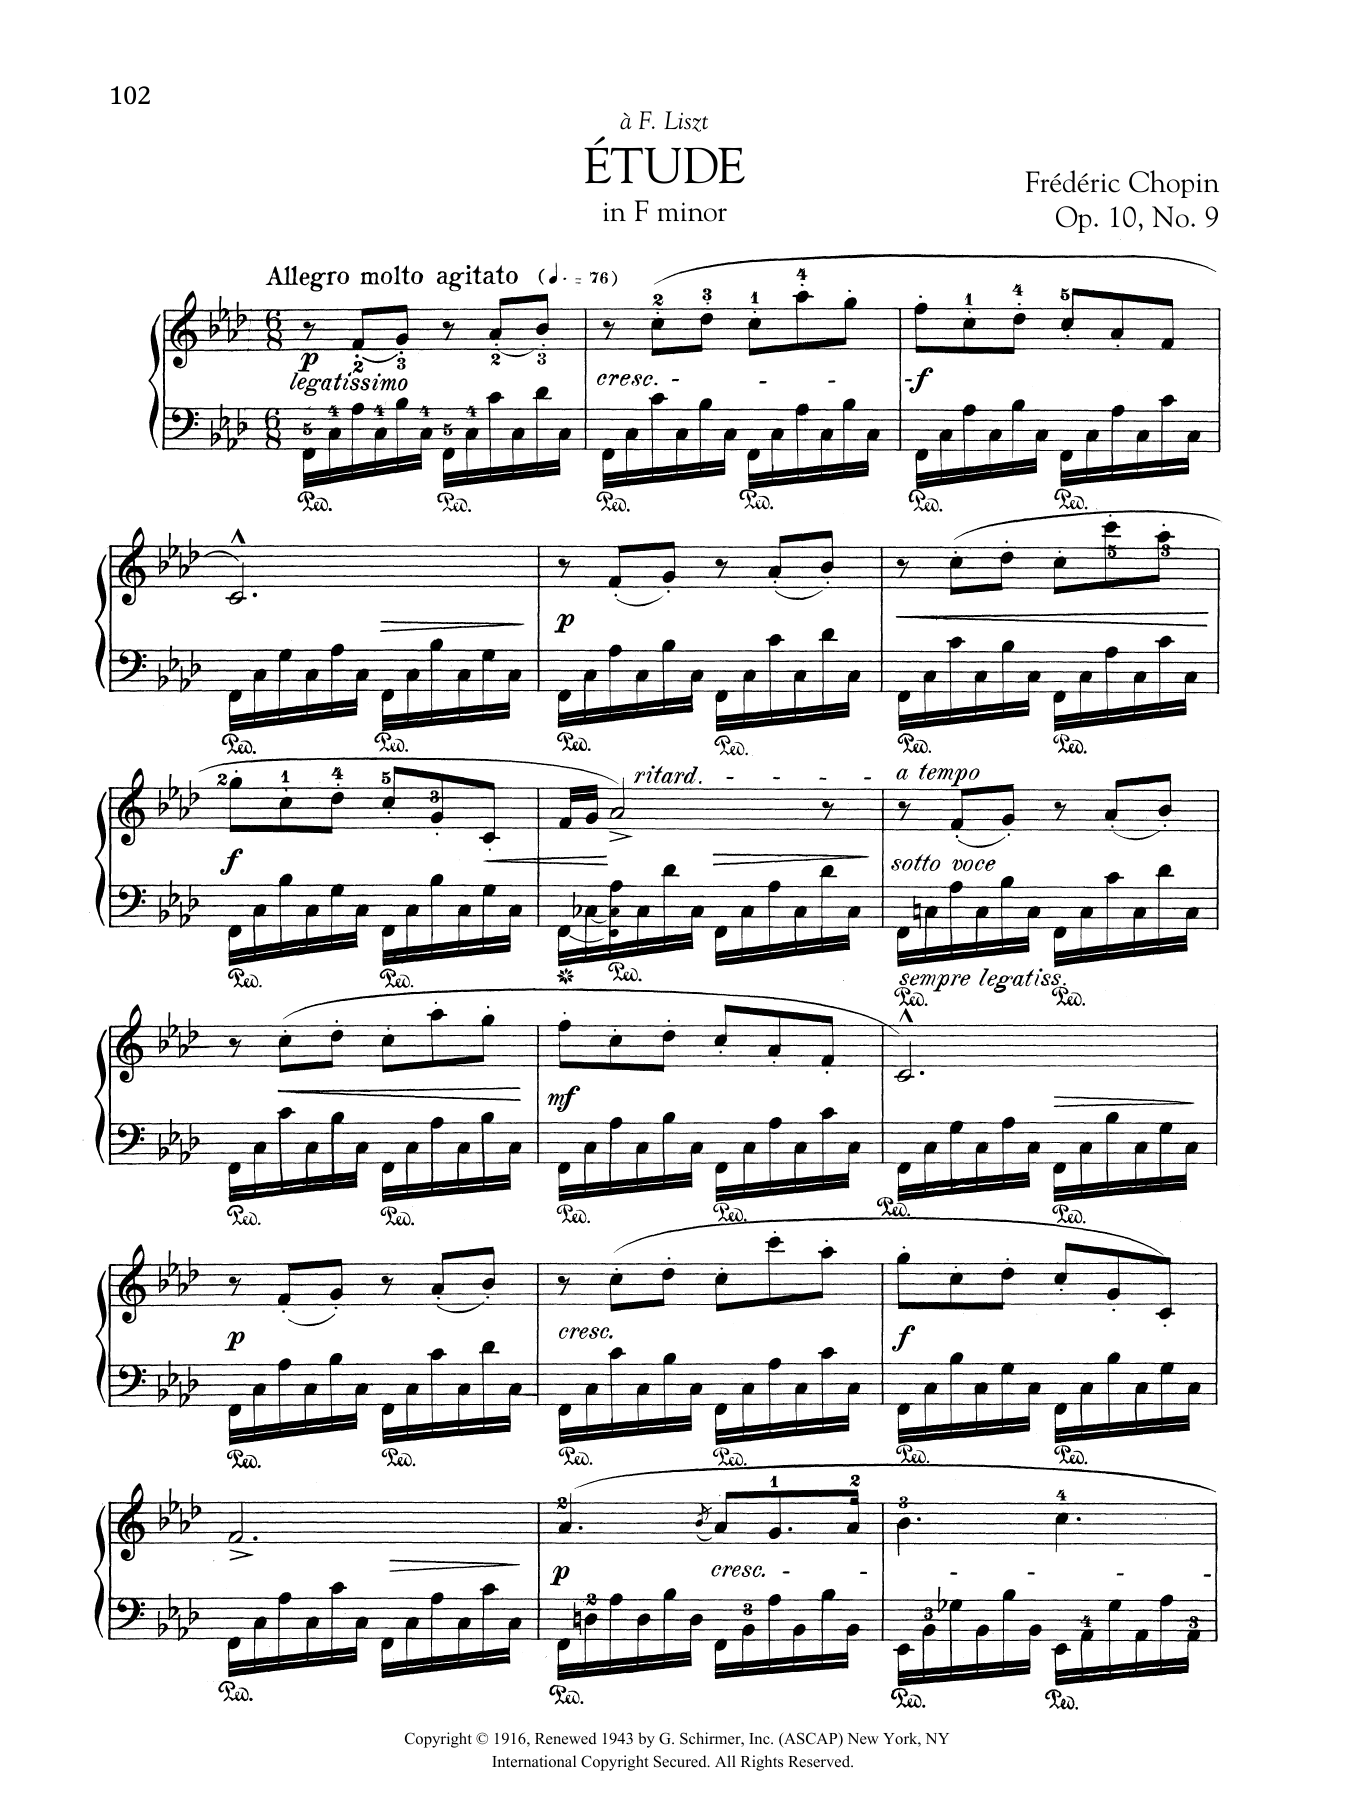 Etude in F minor, Op. 10, No. 9 Sheet Music